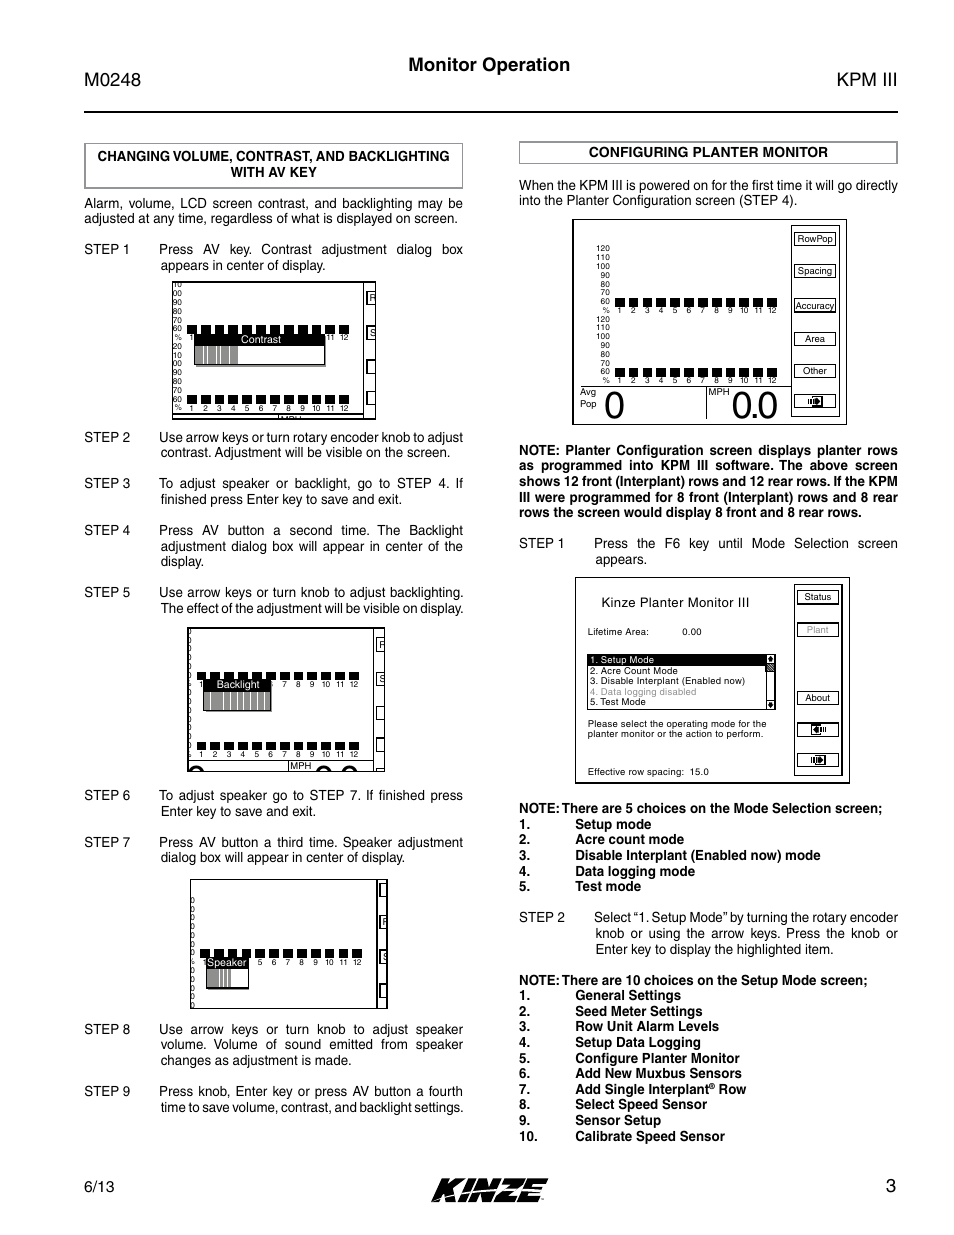 Configuring planter monitor, Kpm iii m0248, 3monitor operation | Kinze KPM  III User Manual